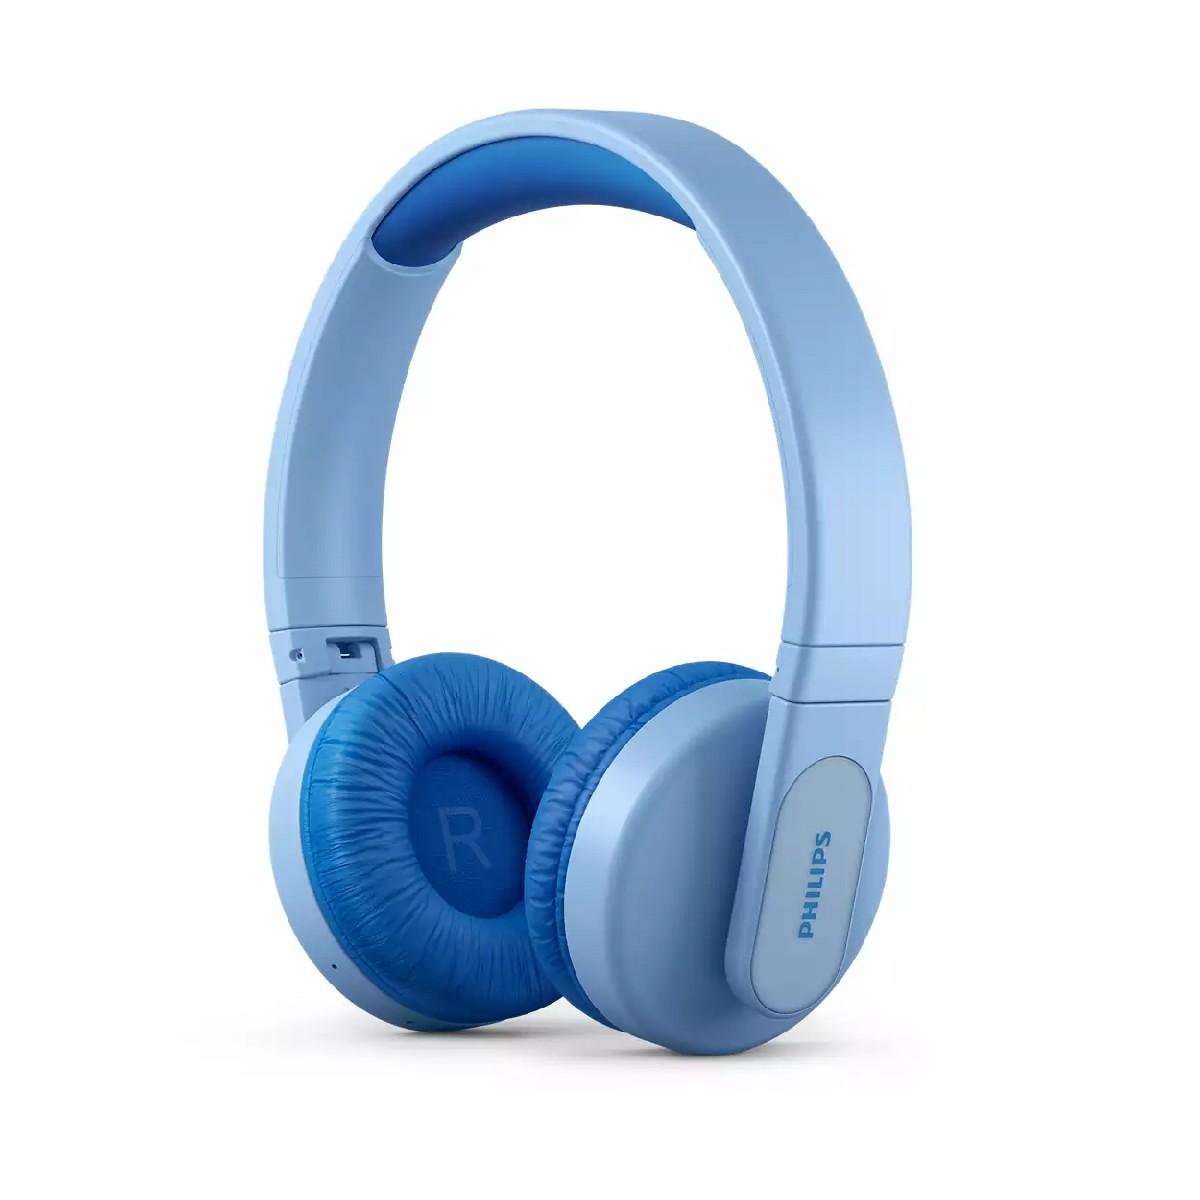 Bluetooth Ακουστικά Stereo Philips Kids TAK4206BL/00 V5.0 Μπλέ On-ear με Μικρόφωνο, Φωτισμό, Πλήκτρα Ελέγχου και Εφαρμογή Γονικού Ελέγχου